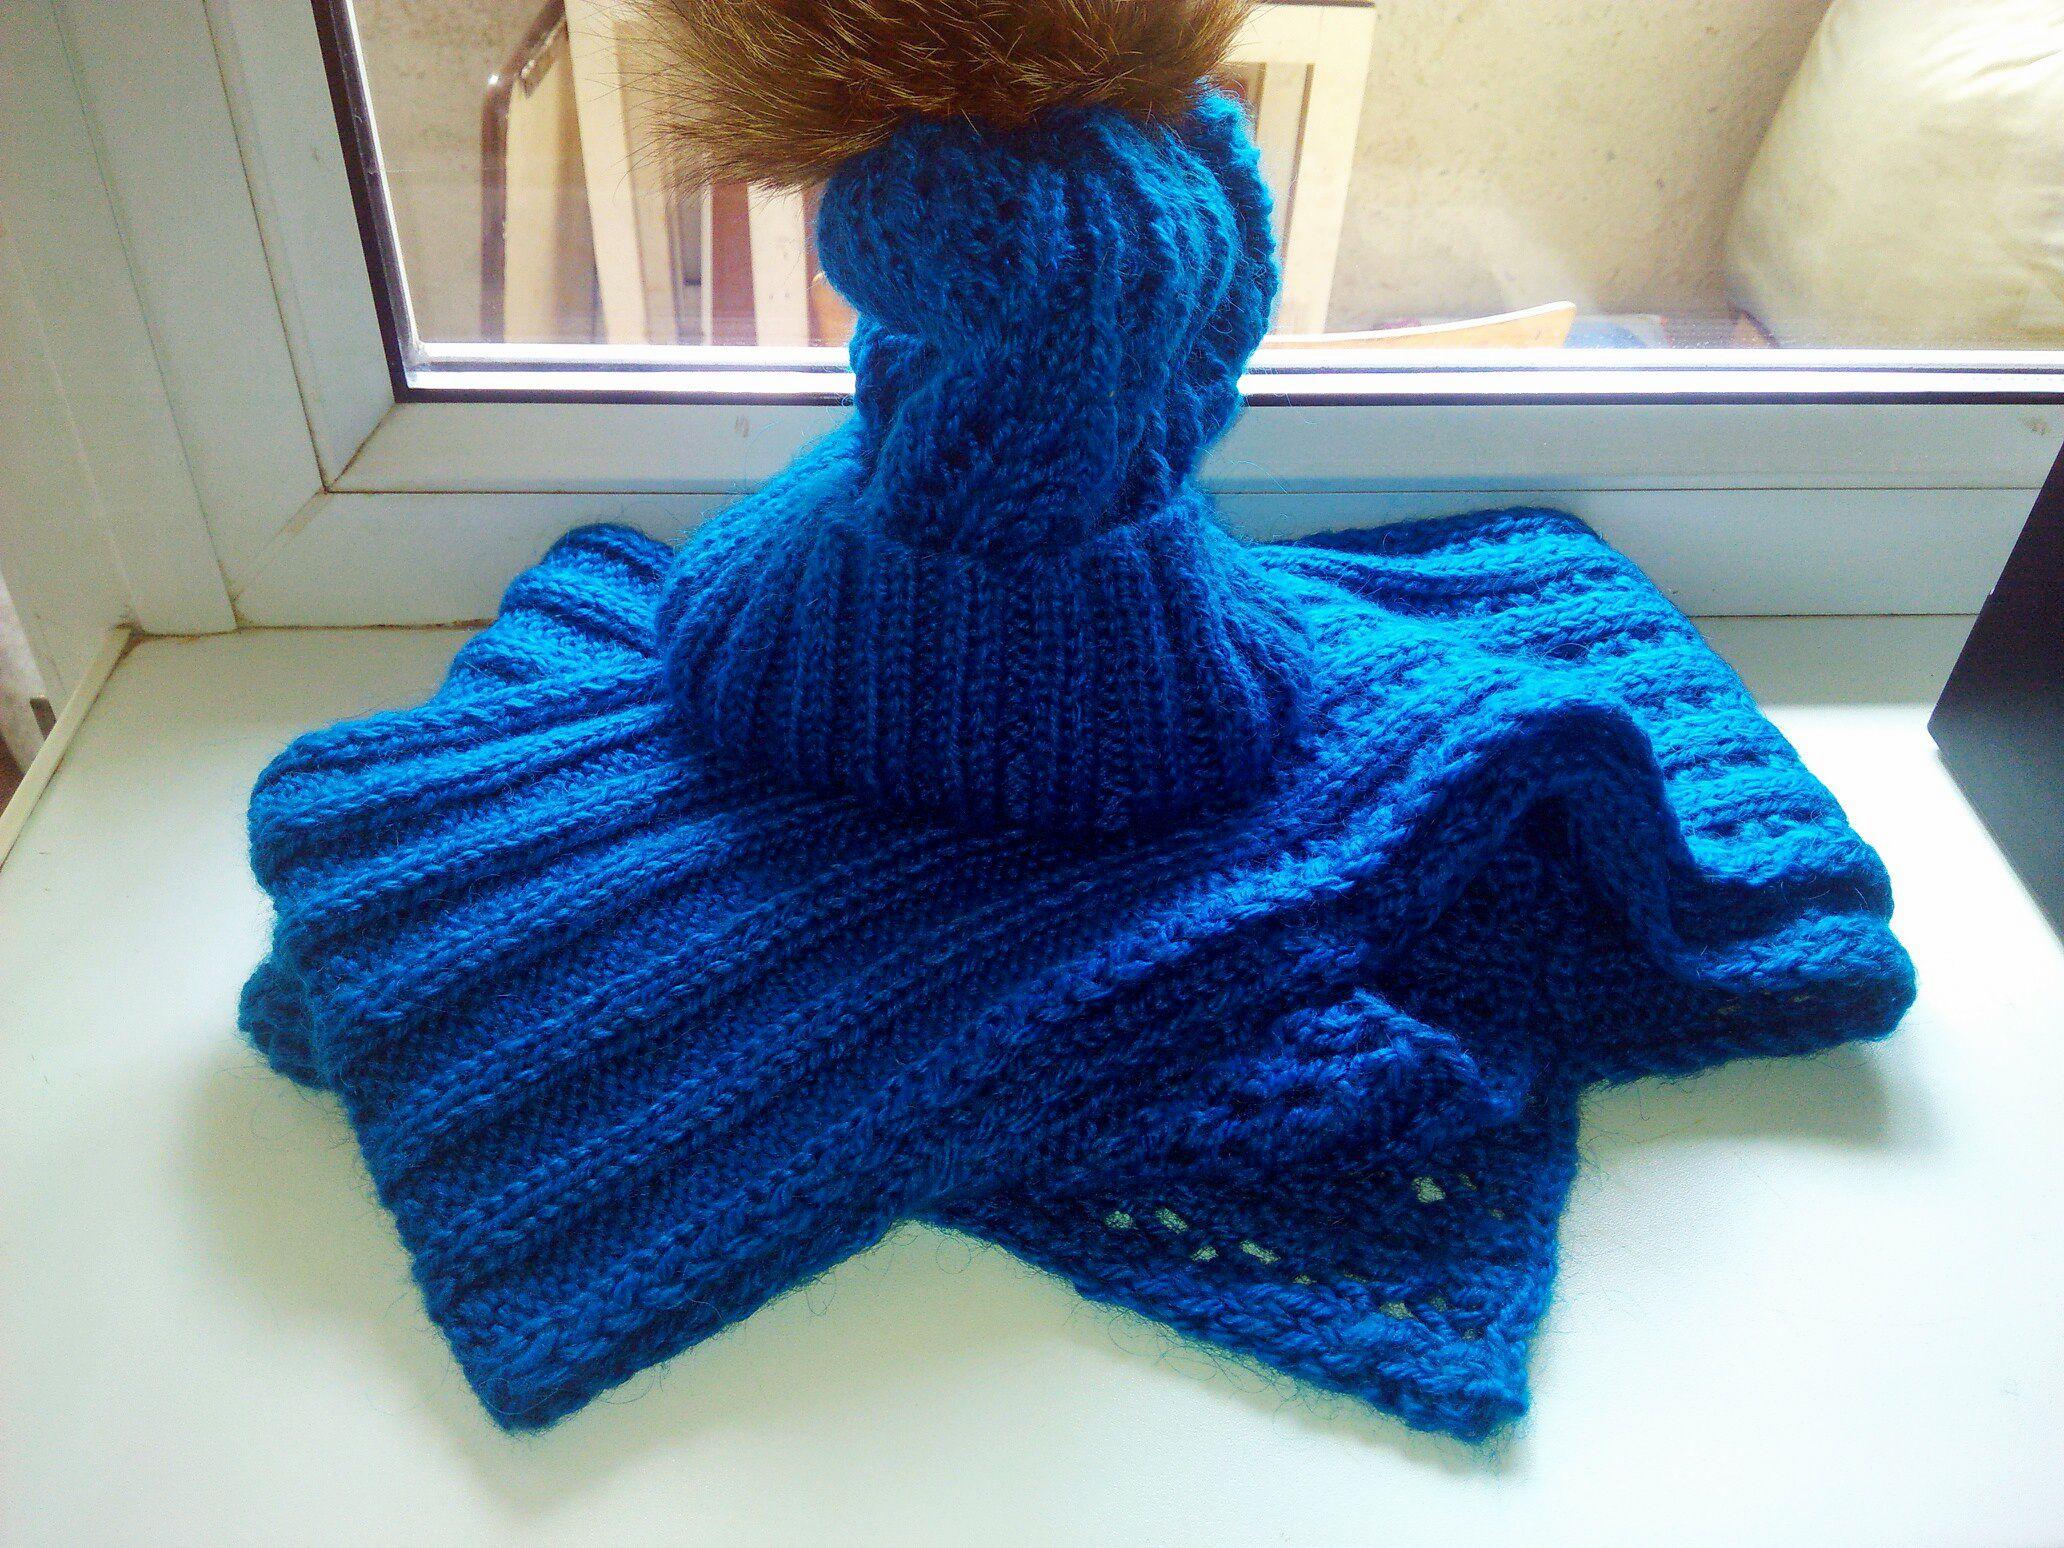 синий мех комплект зимний шапка голубой шарф зимняя